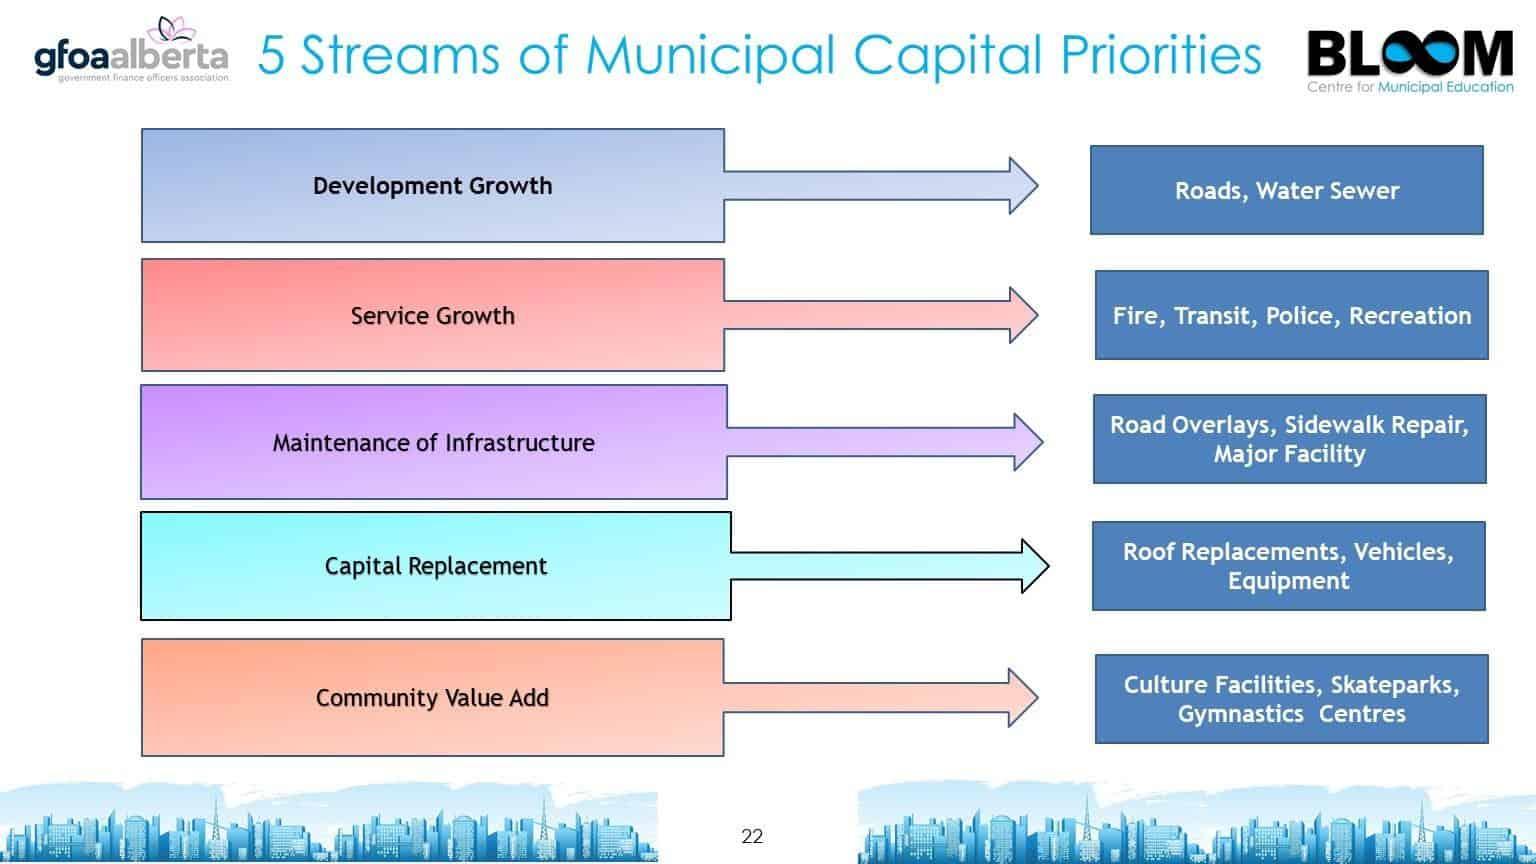 5 streams of municipal capital priorities